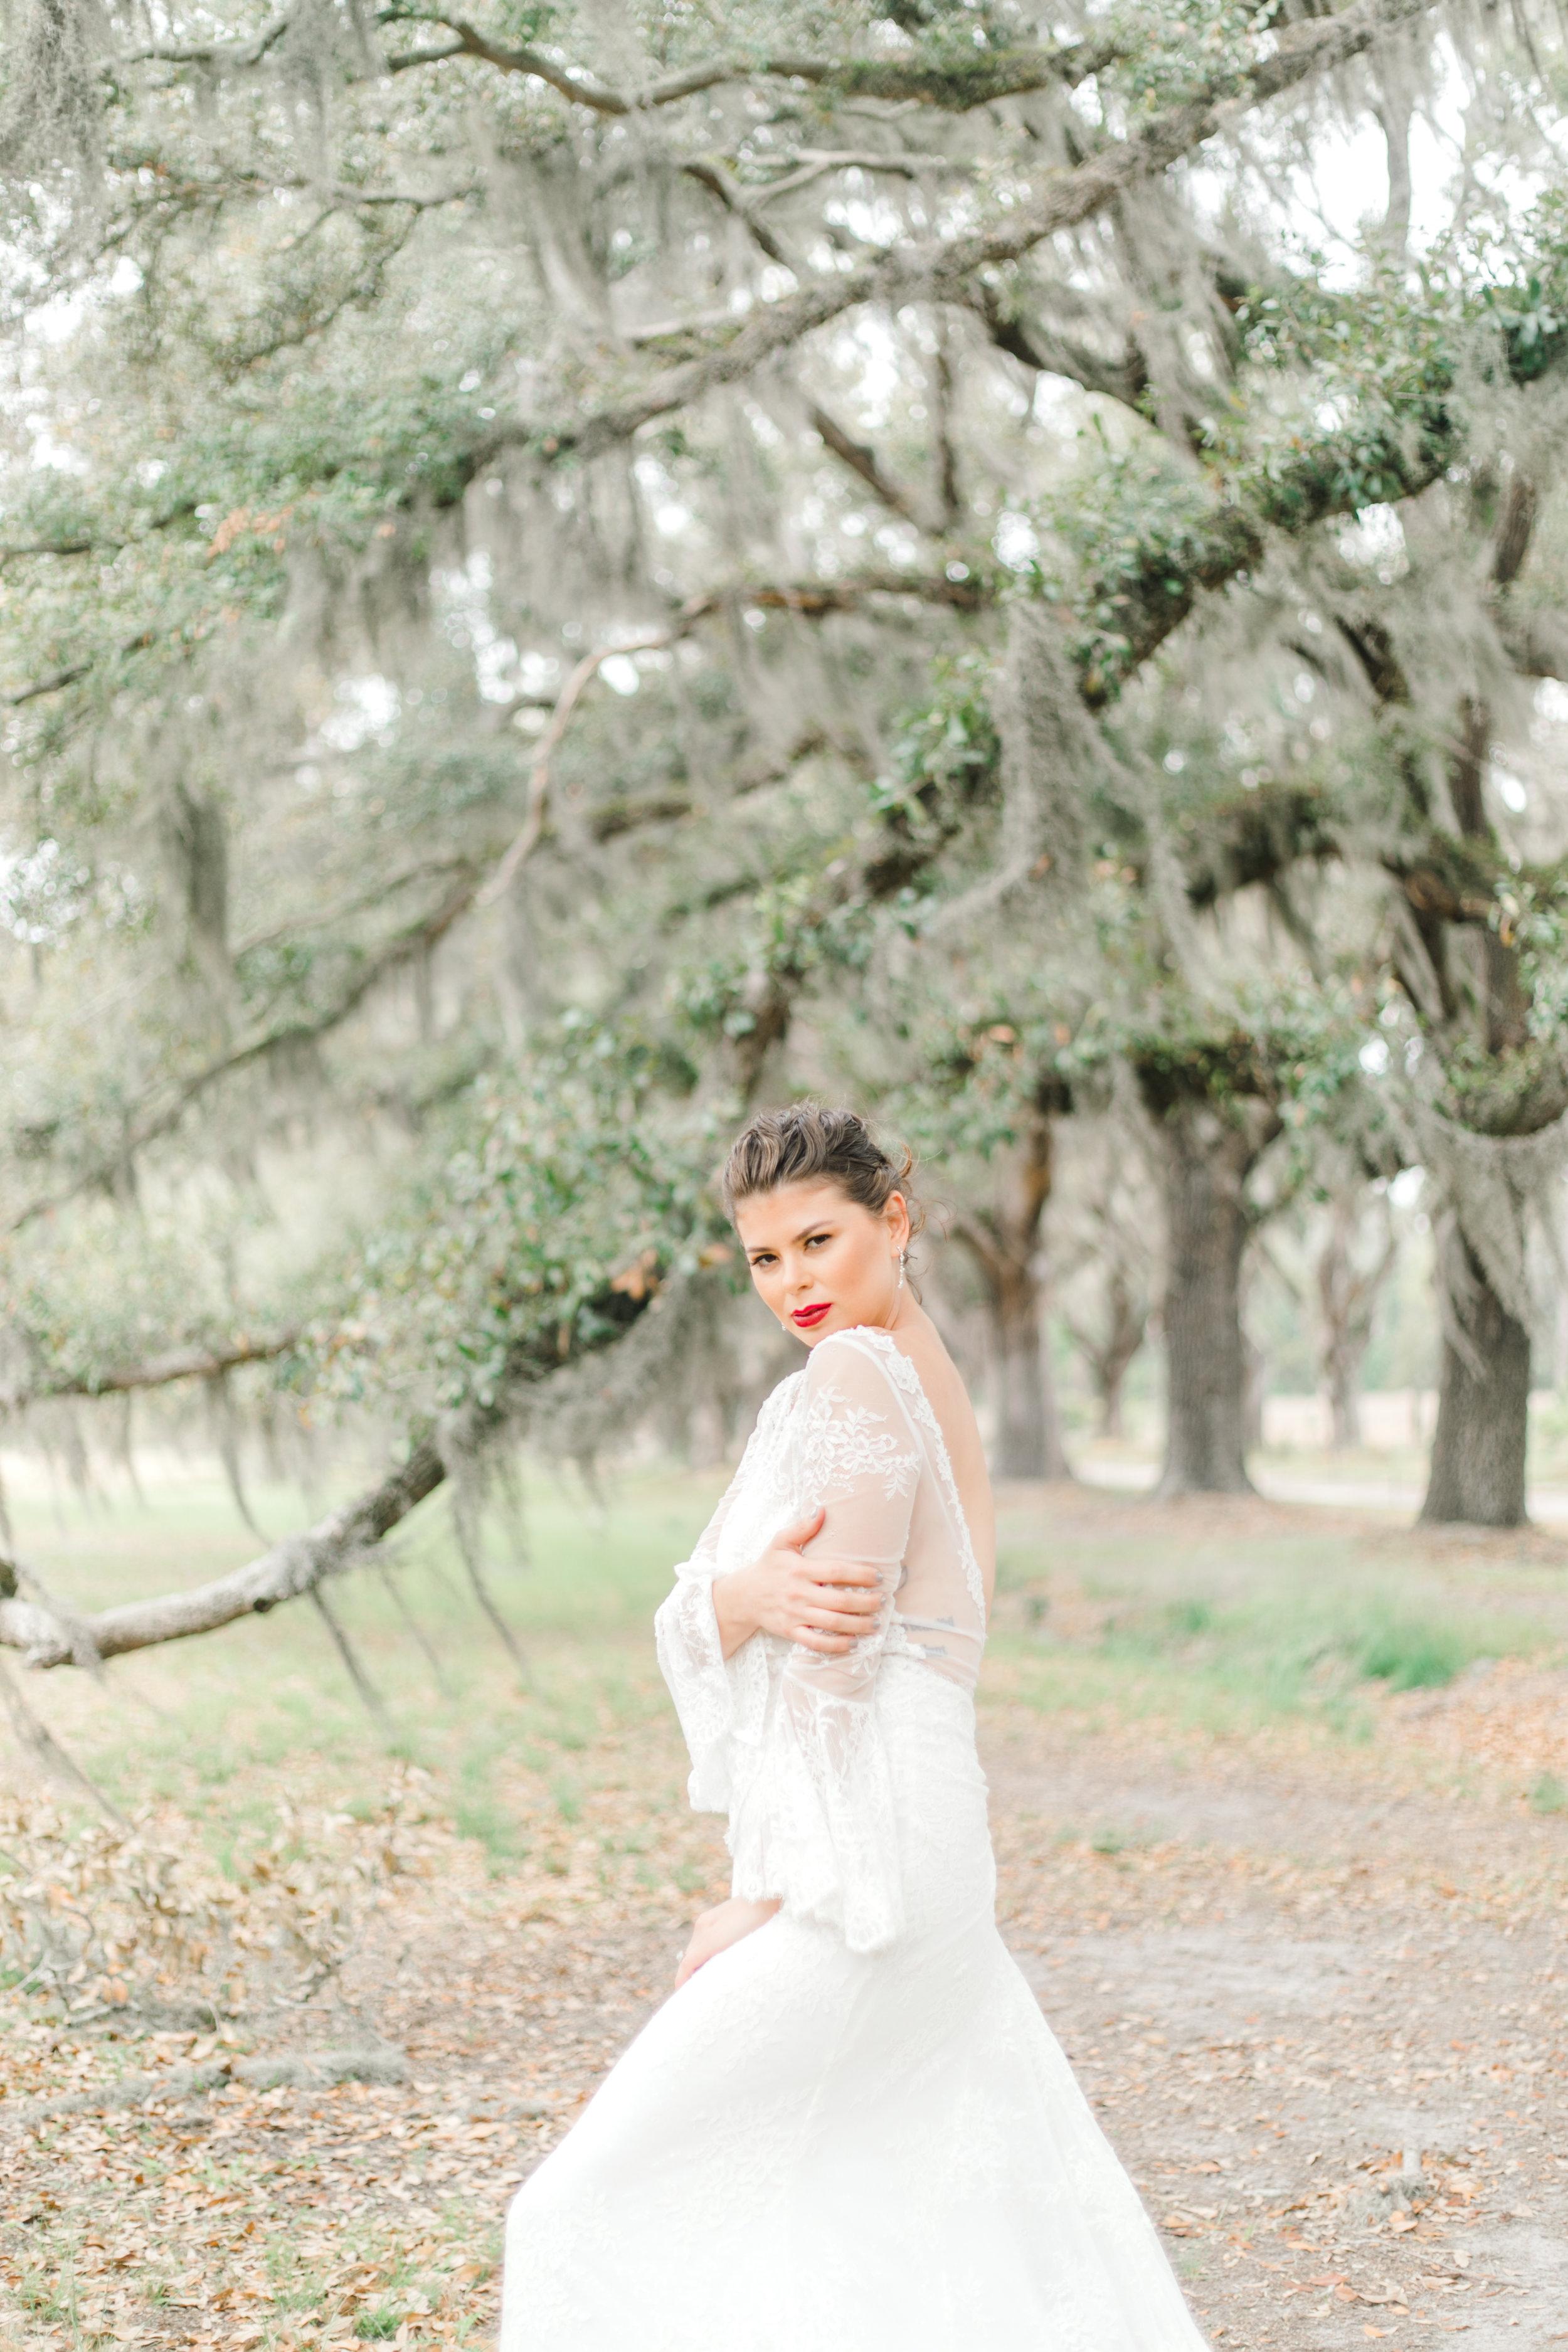 lamour-by-calla-blanche-long-sleeve-wedding-dress-amber-bell-sleeve-wedding-dress-boho-wedding-dress-bohemian-wedding-dress-at-wormsloe-historic-park-savannah-georgia.jpg